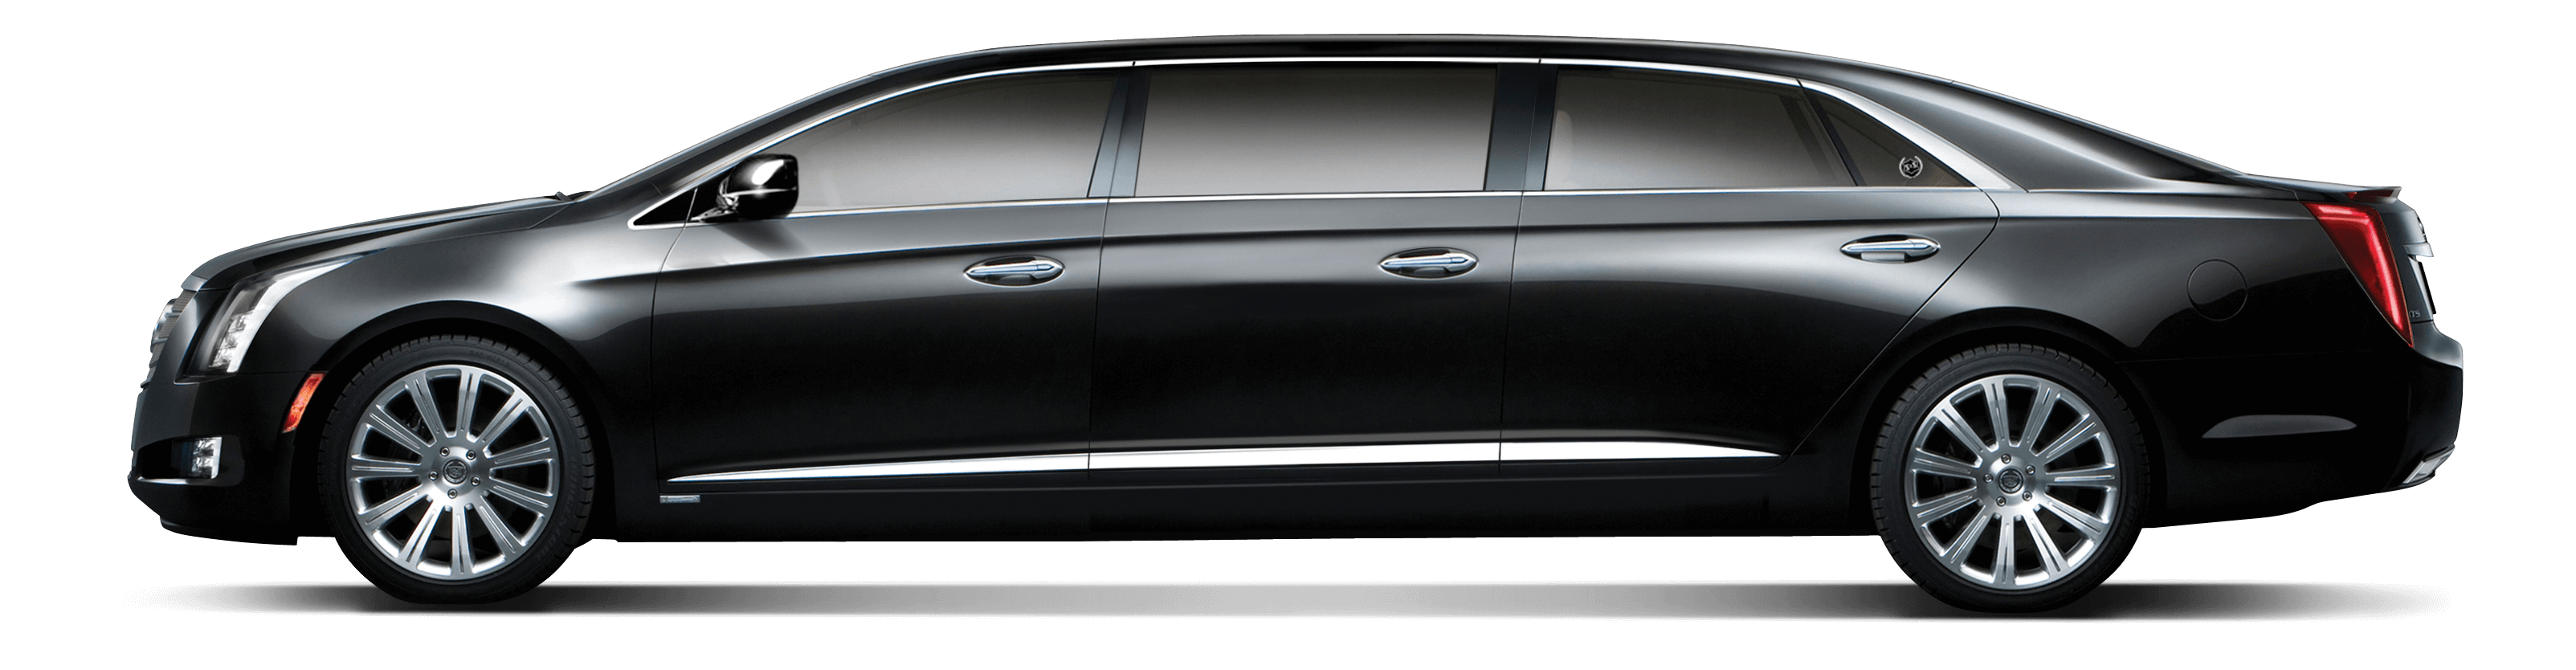 Cadilac car clipart graphic royalty free download Cadillac PNG Image - PurePNG | Free transparent CC0 PNG Image Library graphic royalty free download